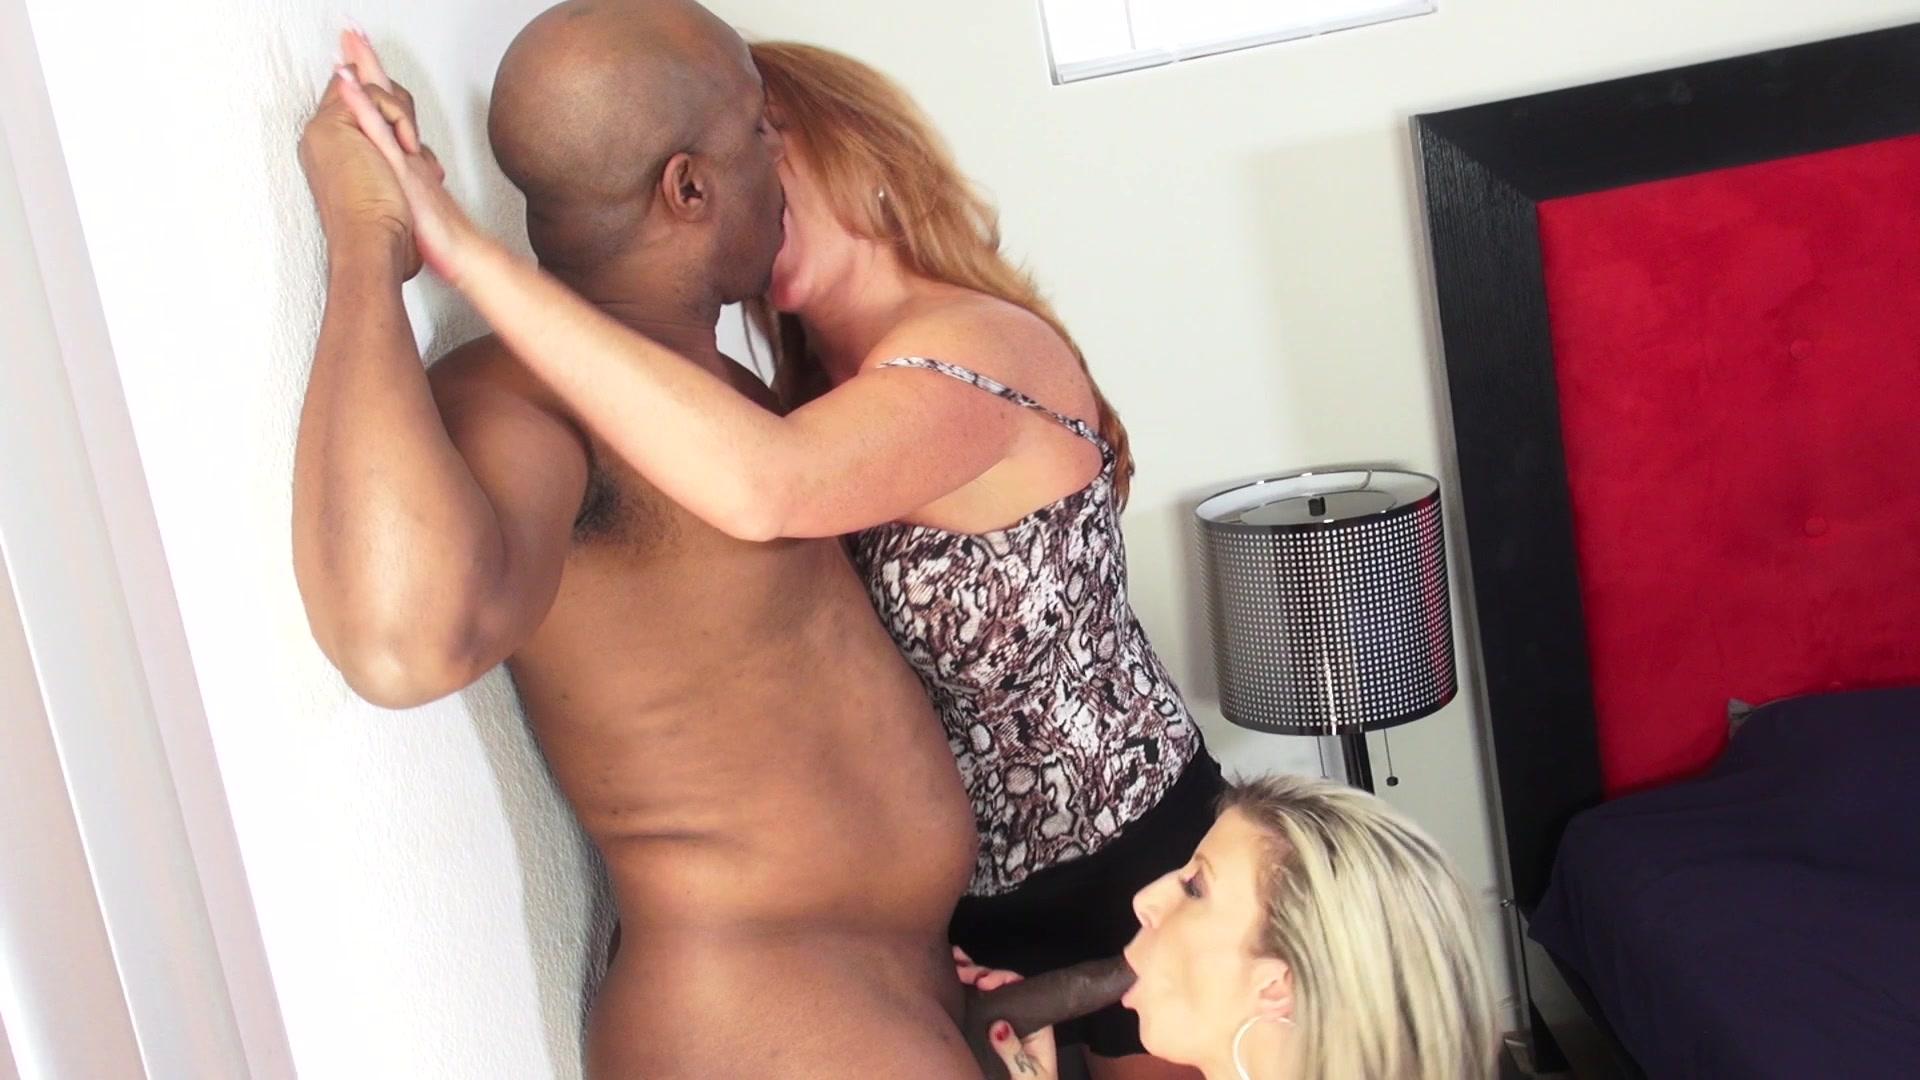 Sara Jay Loves White Chicks  Black Dicks 2014  Adult Empire-7812